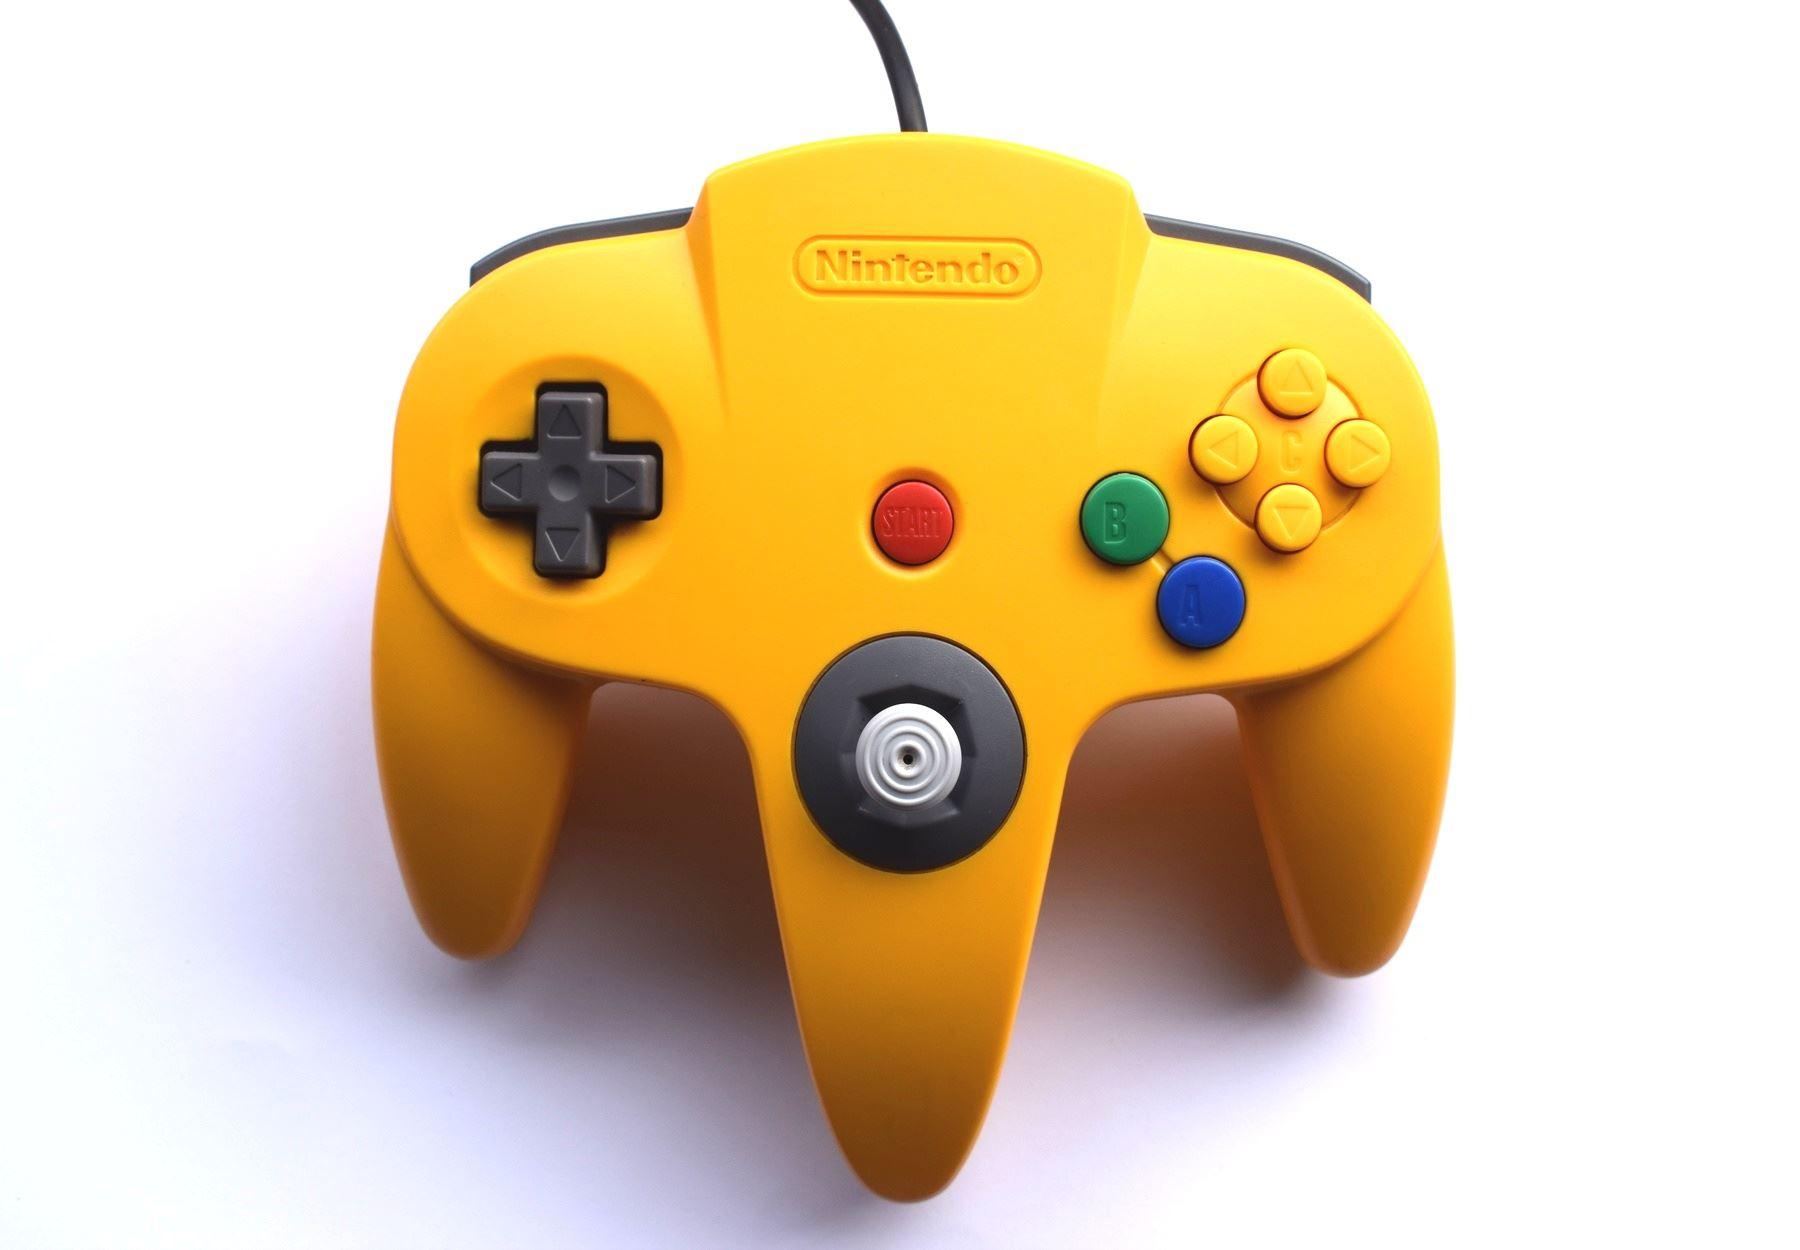 Official-Original-Nintendo-64-N64-Genuine-Controller-Game-Pads